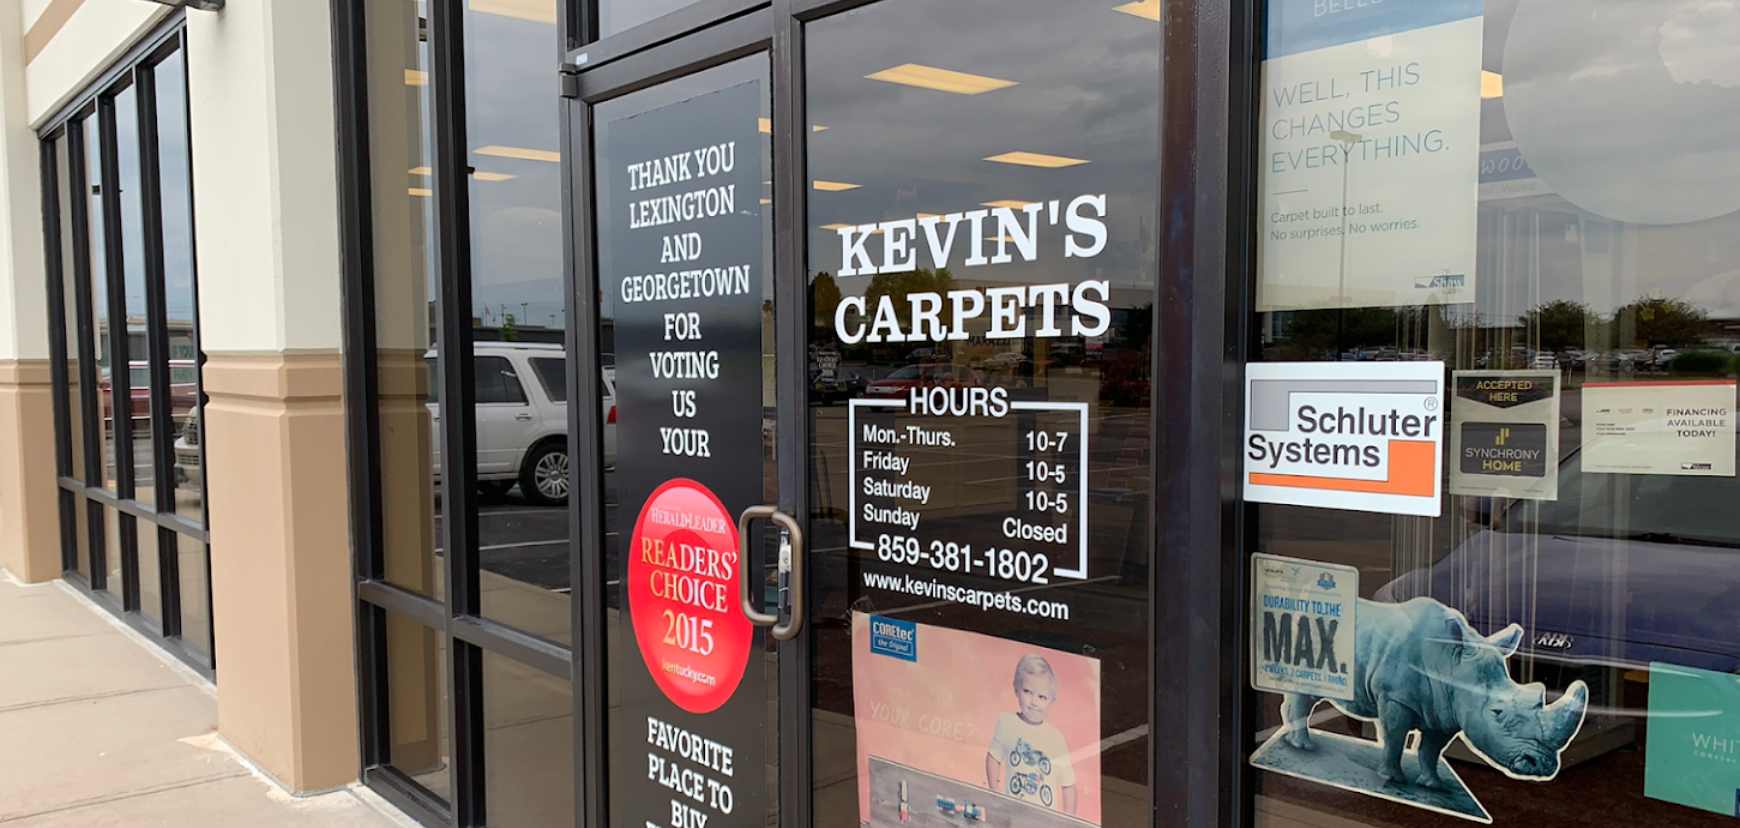 Kevin's Carpets - 3851 Mall Rd #190, Lexington, KY 40503